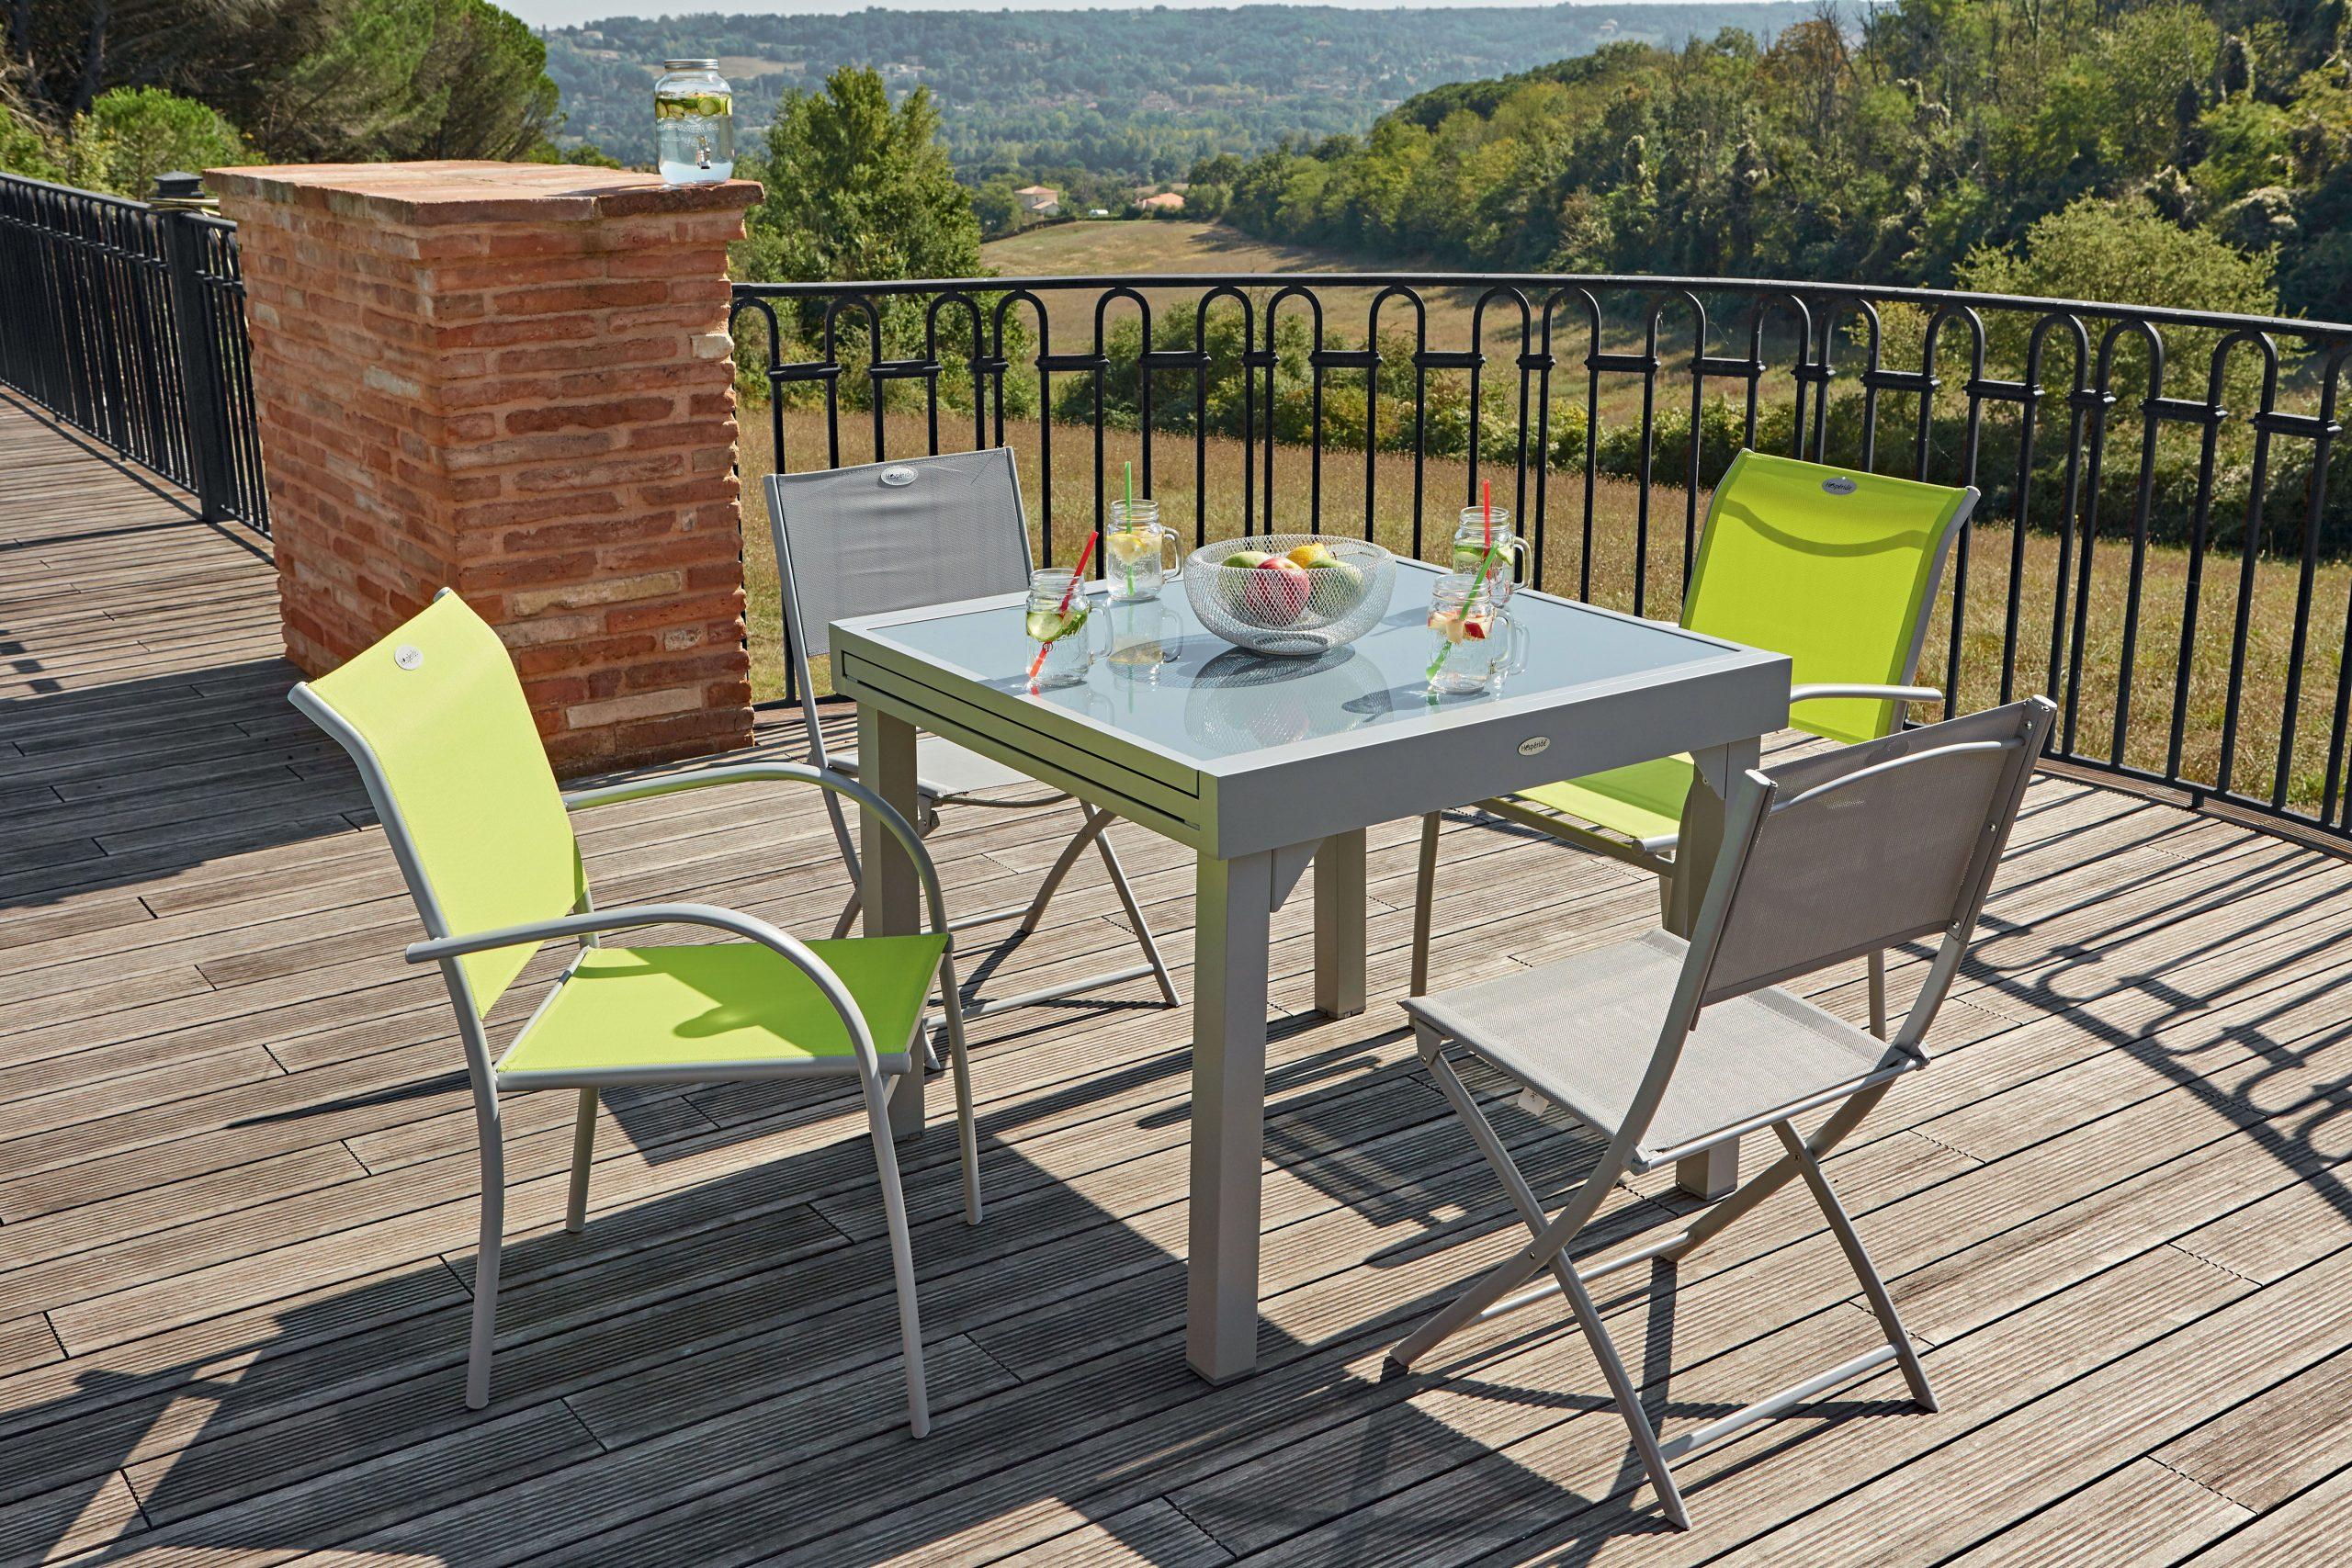 55 Porte Vitrée Leroy Merlin 2020 | Salon De Jardin ... concernant Table De Jardin Centrakor